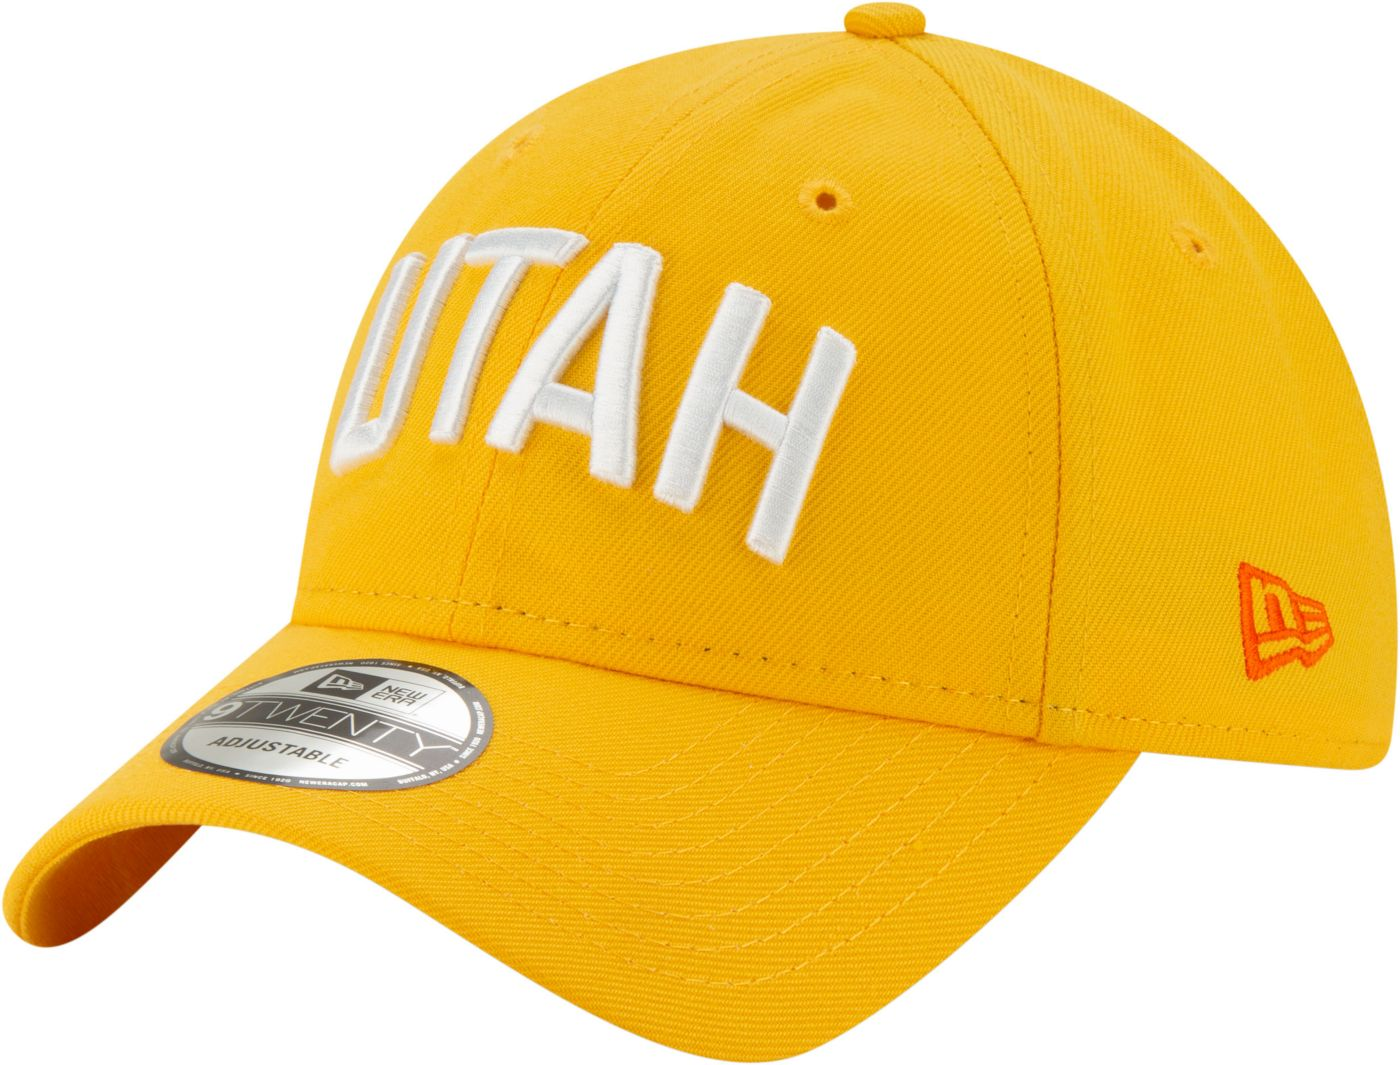 New Era Men's Utah Jazz 9Twenty City Edition Adjustable Hat